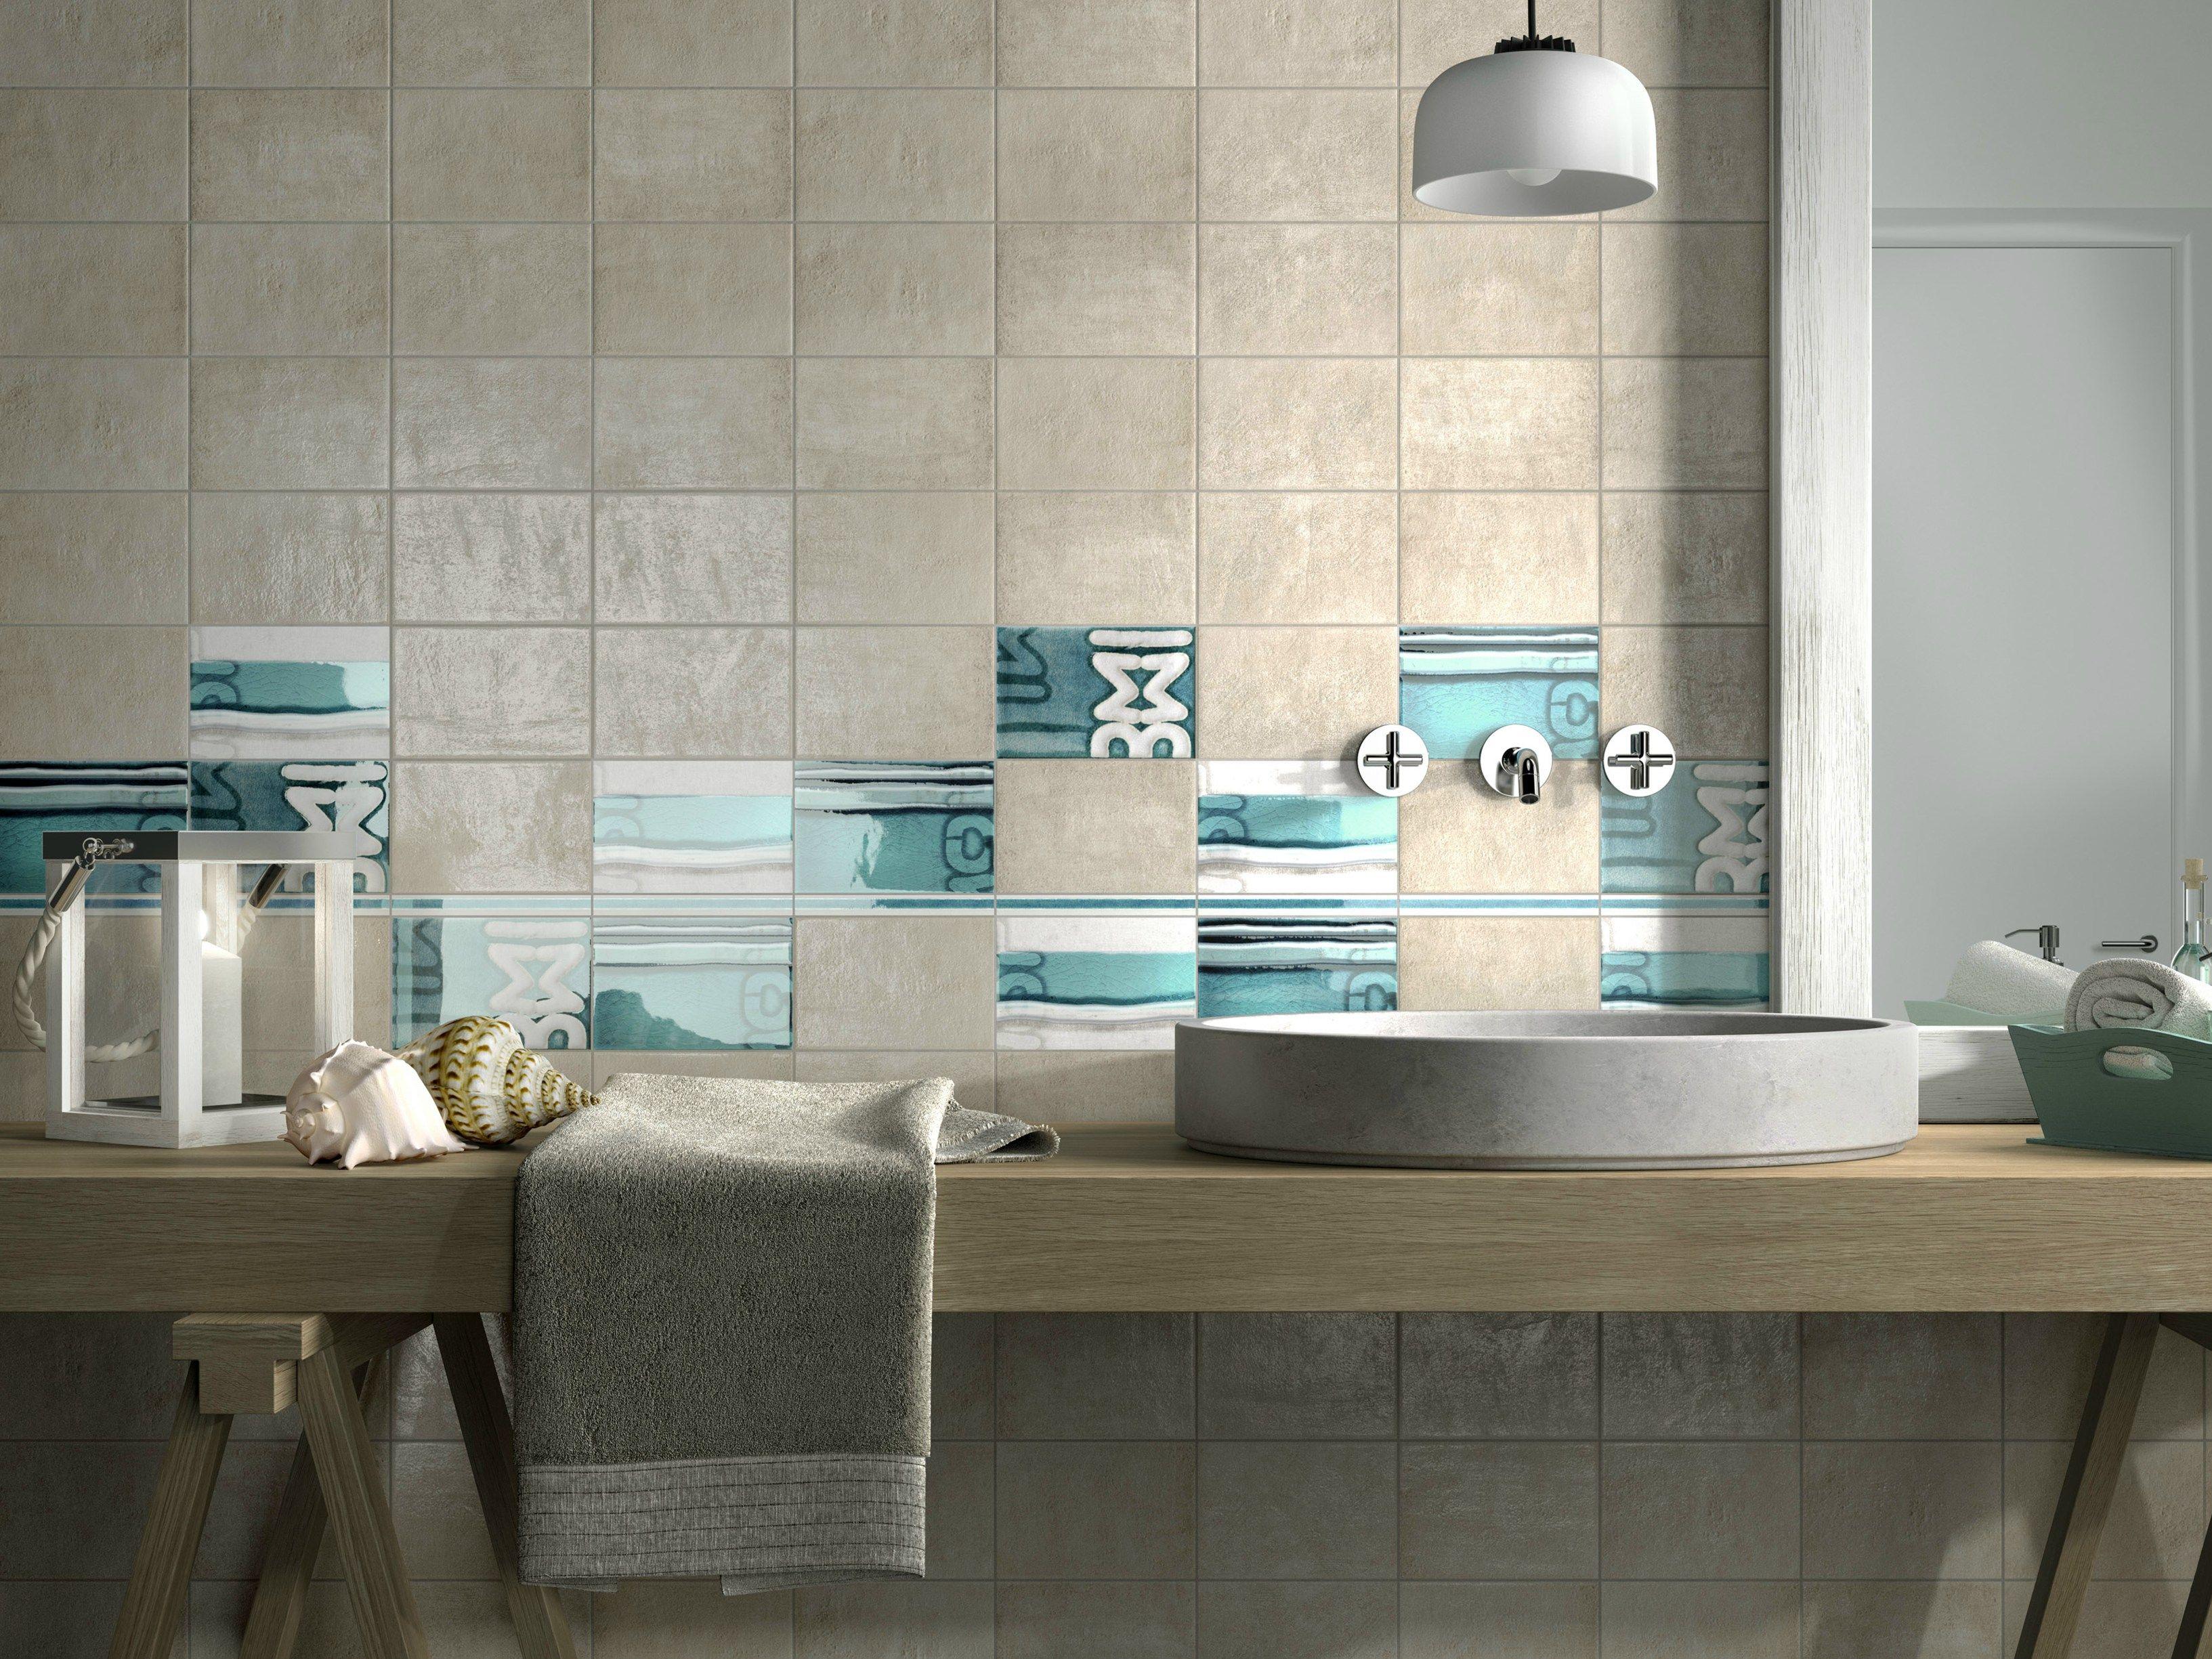 Ceramica imola boiserie in ceramica per bagno - Produzione piastrelle ceramica ...